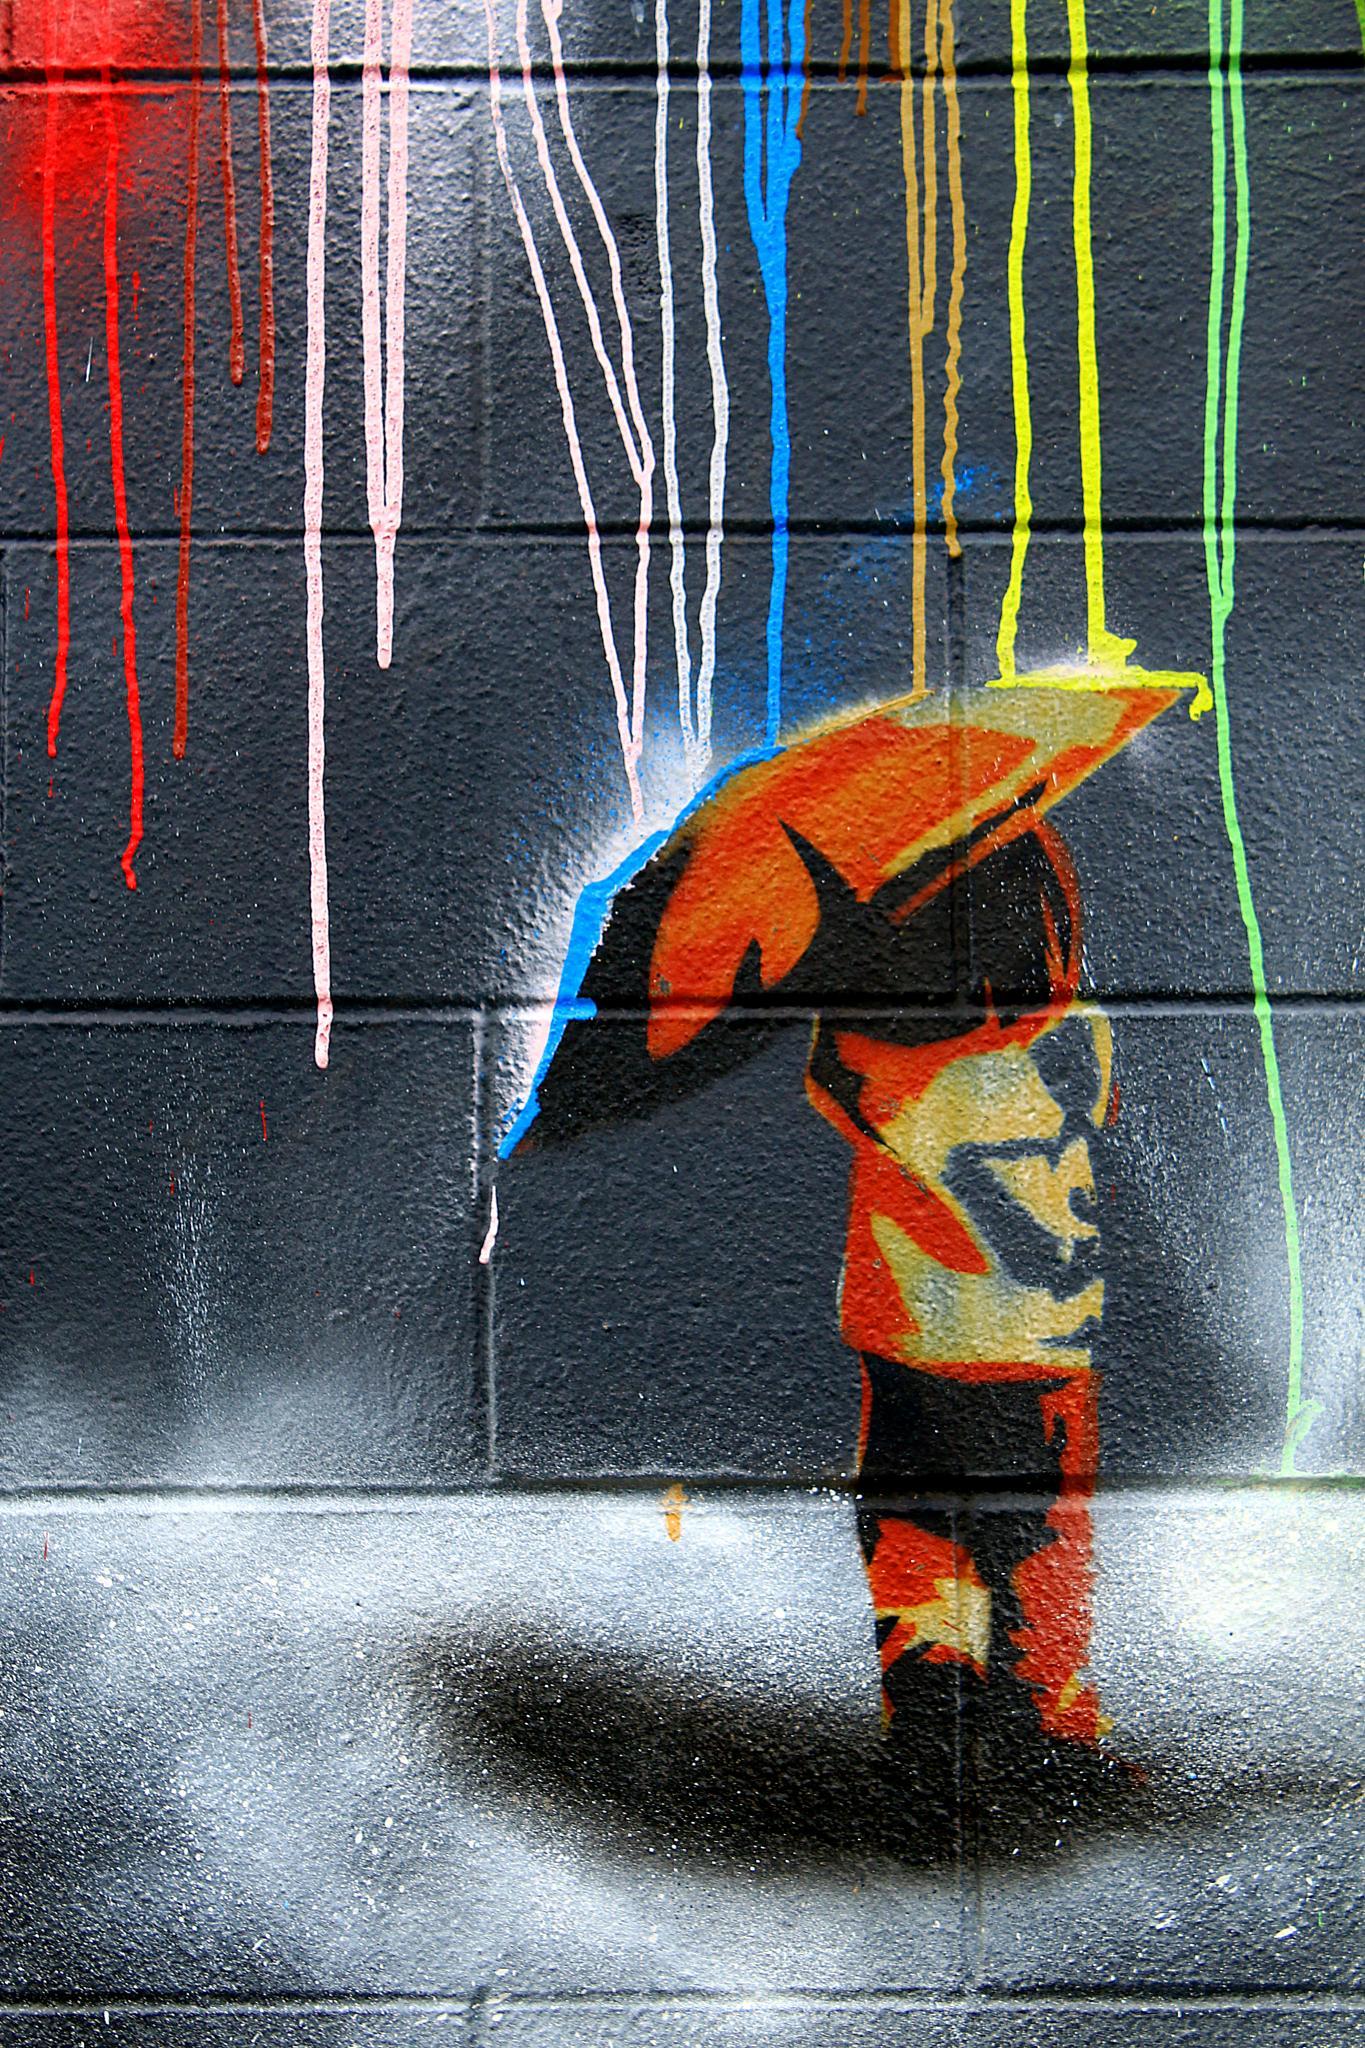 Street Art - Mural by Phil Le Cren